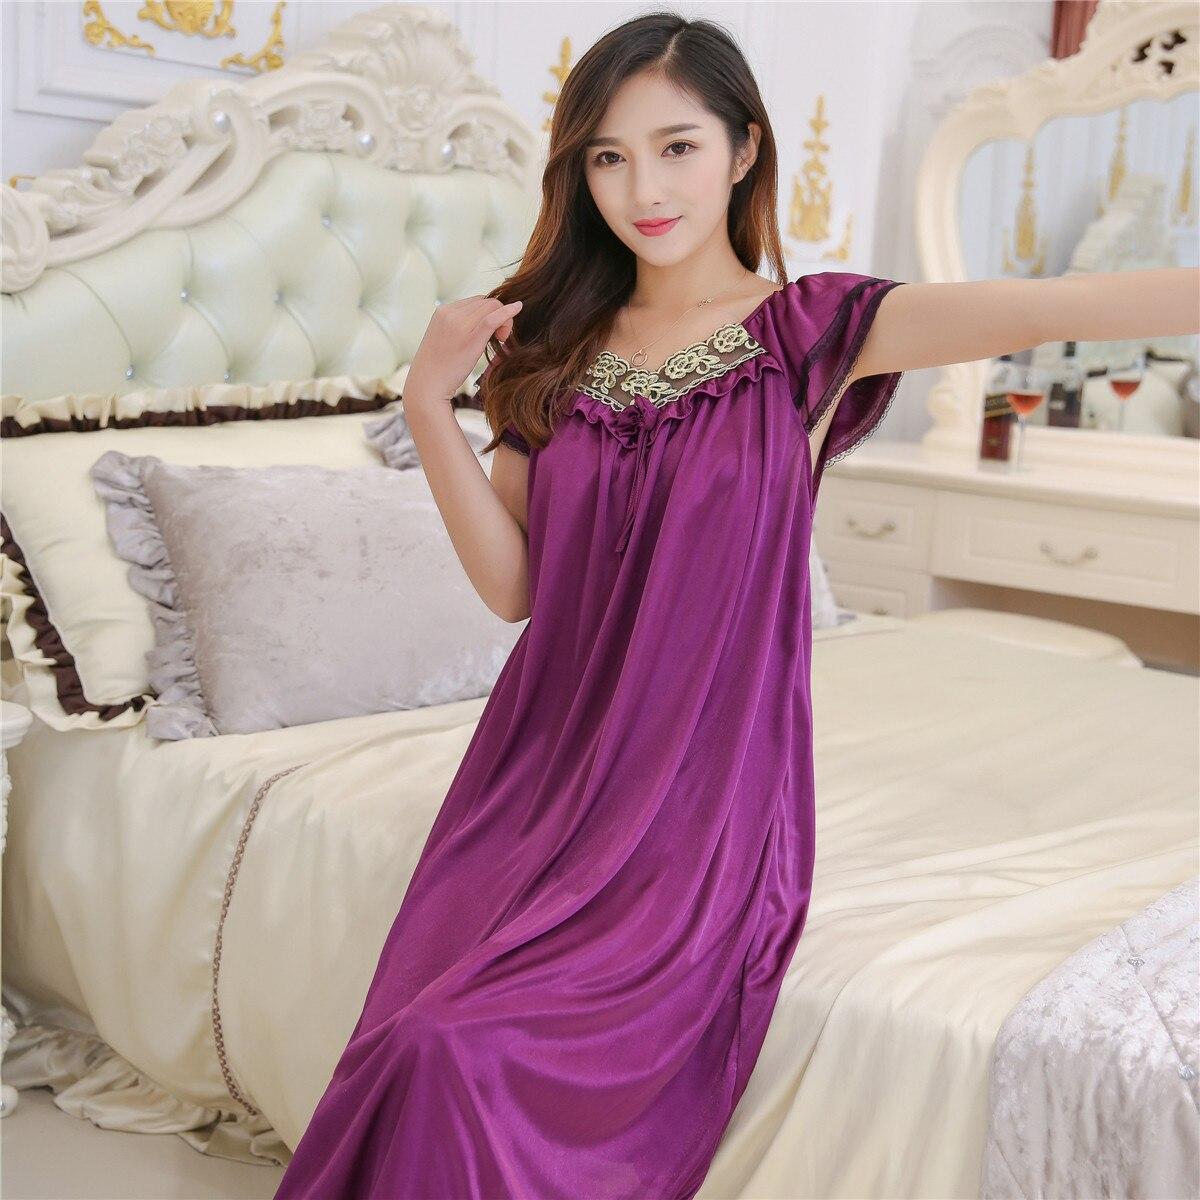 Summer Viscose Nightgown Women's Plus-sized Size Midi-skirt Thin One-piece Tracksuit Pajamas